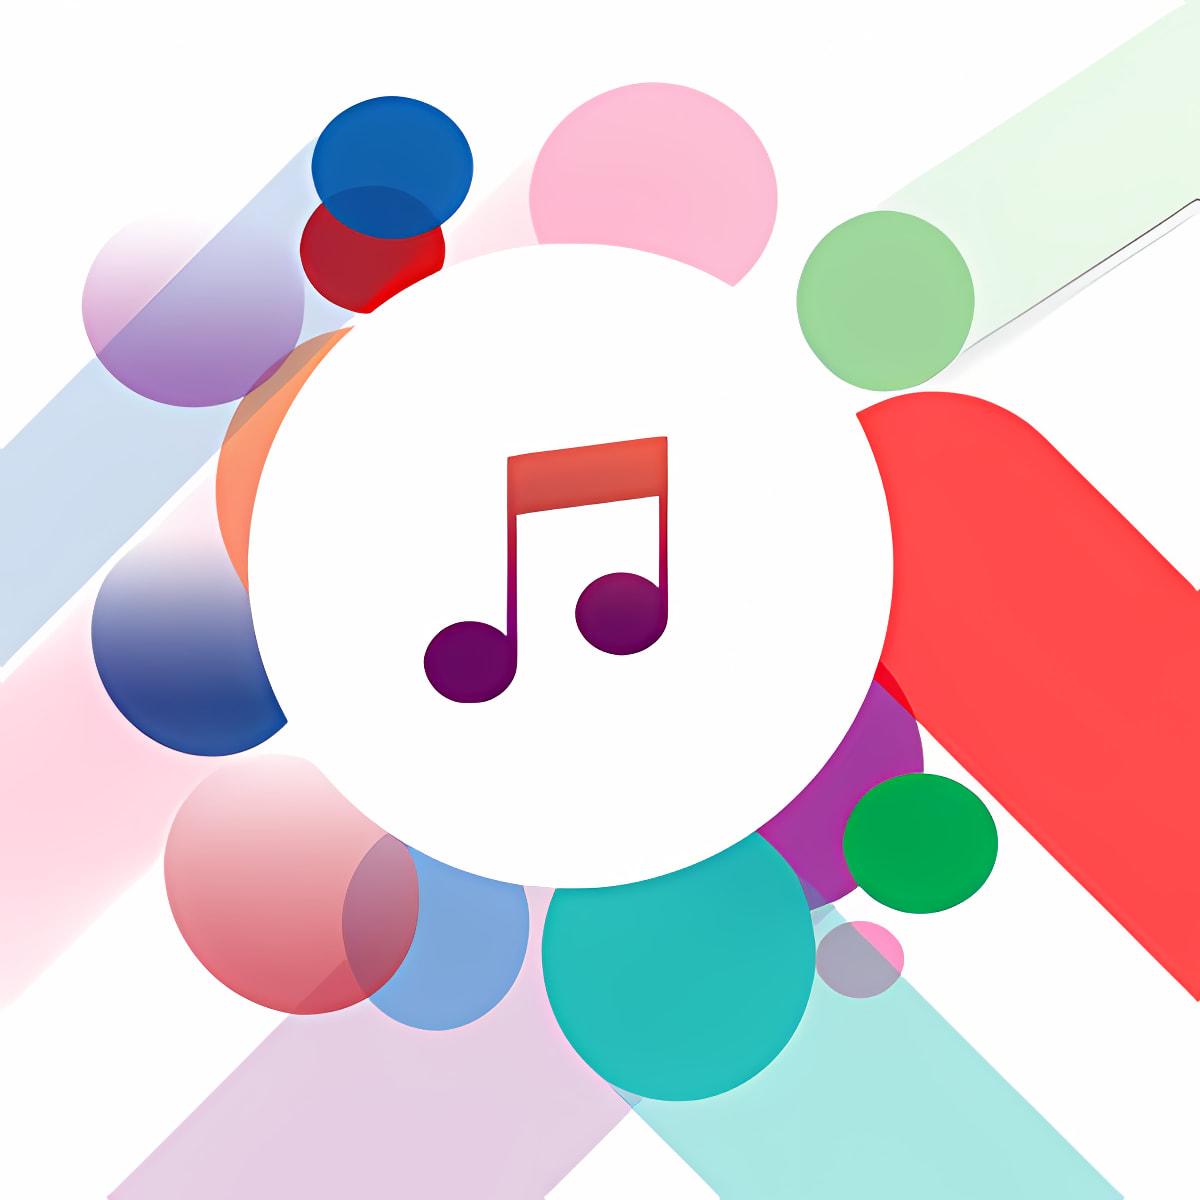 Kavadarce - Your music buddy 2.0